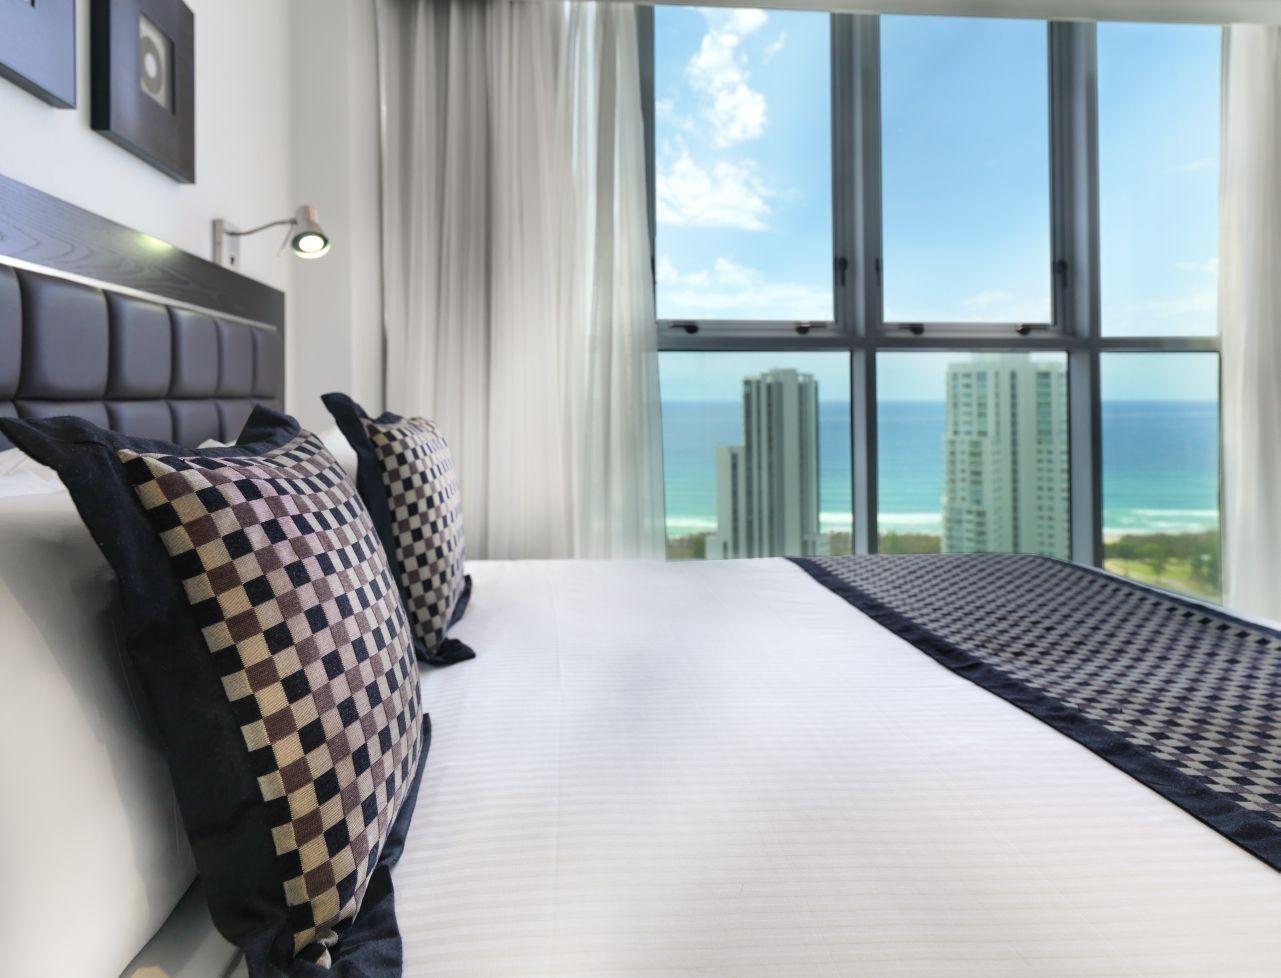 Bedroom Ocean View Apartment GoldCoast Australia Hotels Luxury